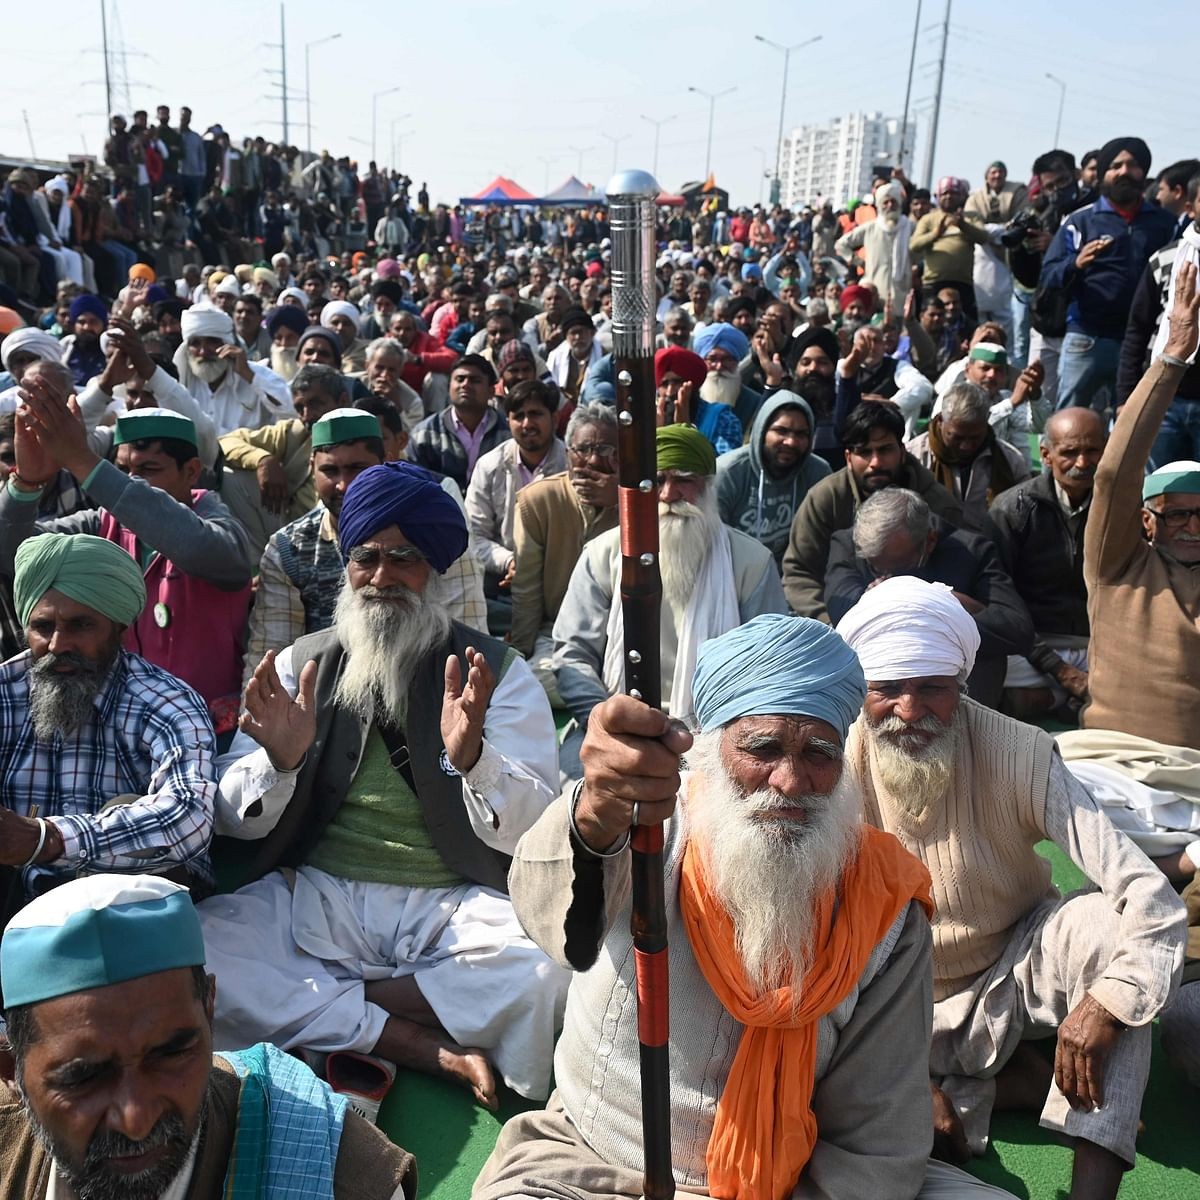 Govt suspends internet services till 31 Jan at Singhu, Ghazipur, Tikri borders amid farmers' protest